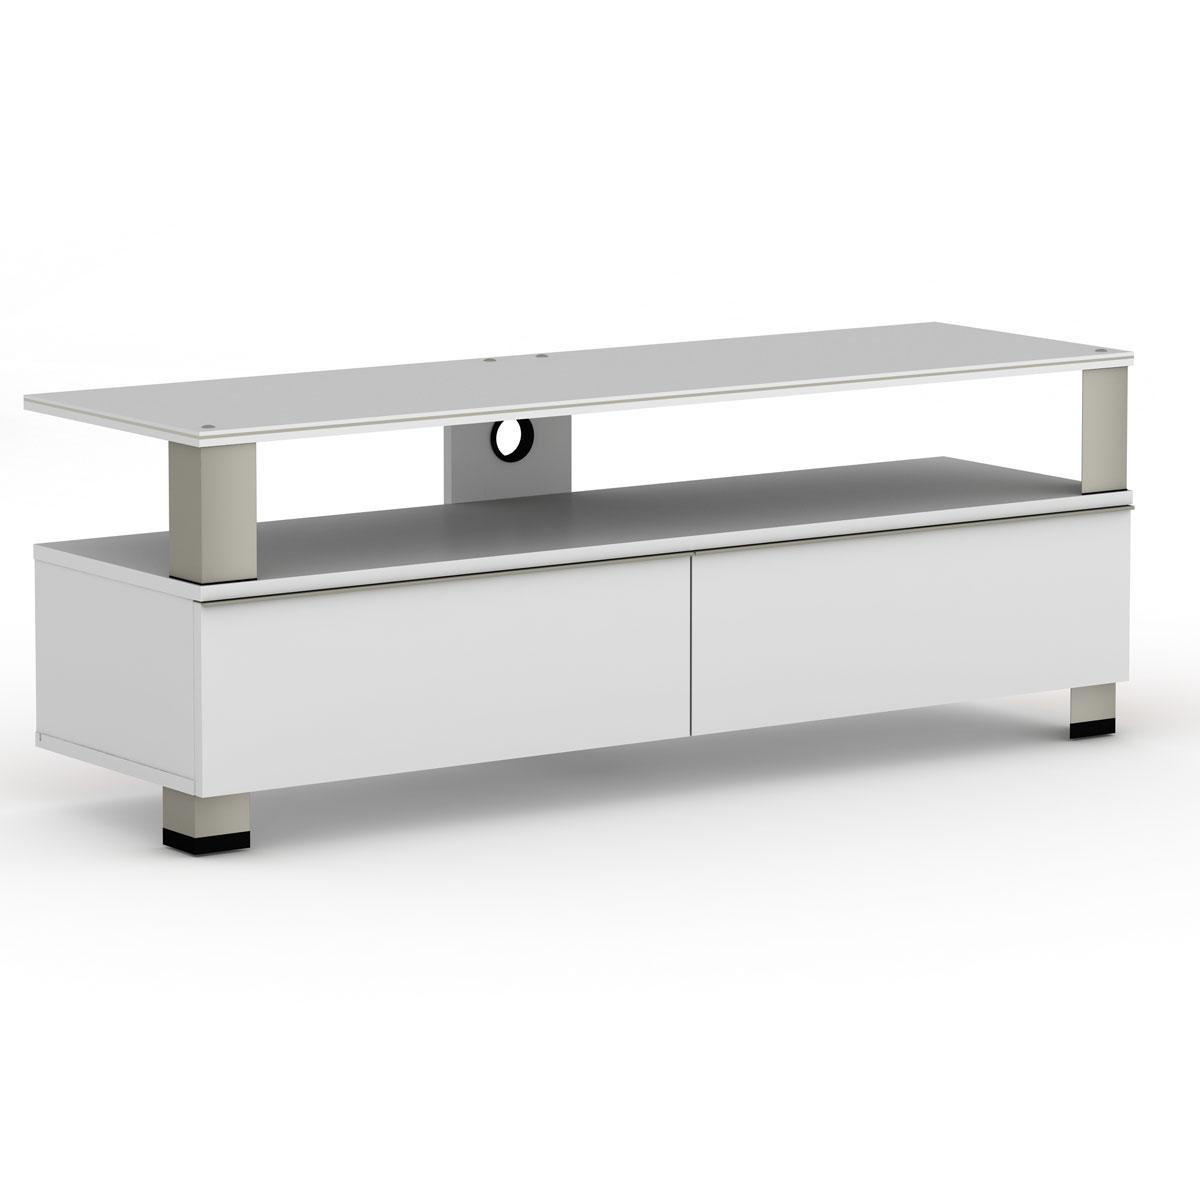 Elmob tura tu 140 03 blanc meuble tv elmob sur ldlc for Meuble tv pour ecran plat 140 cm